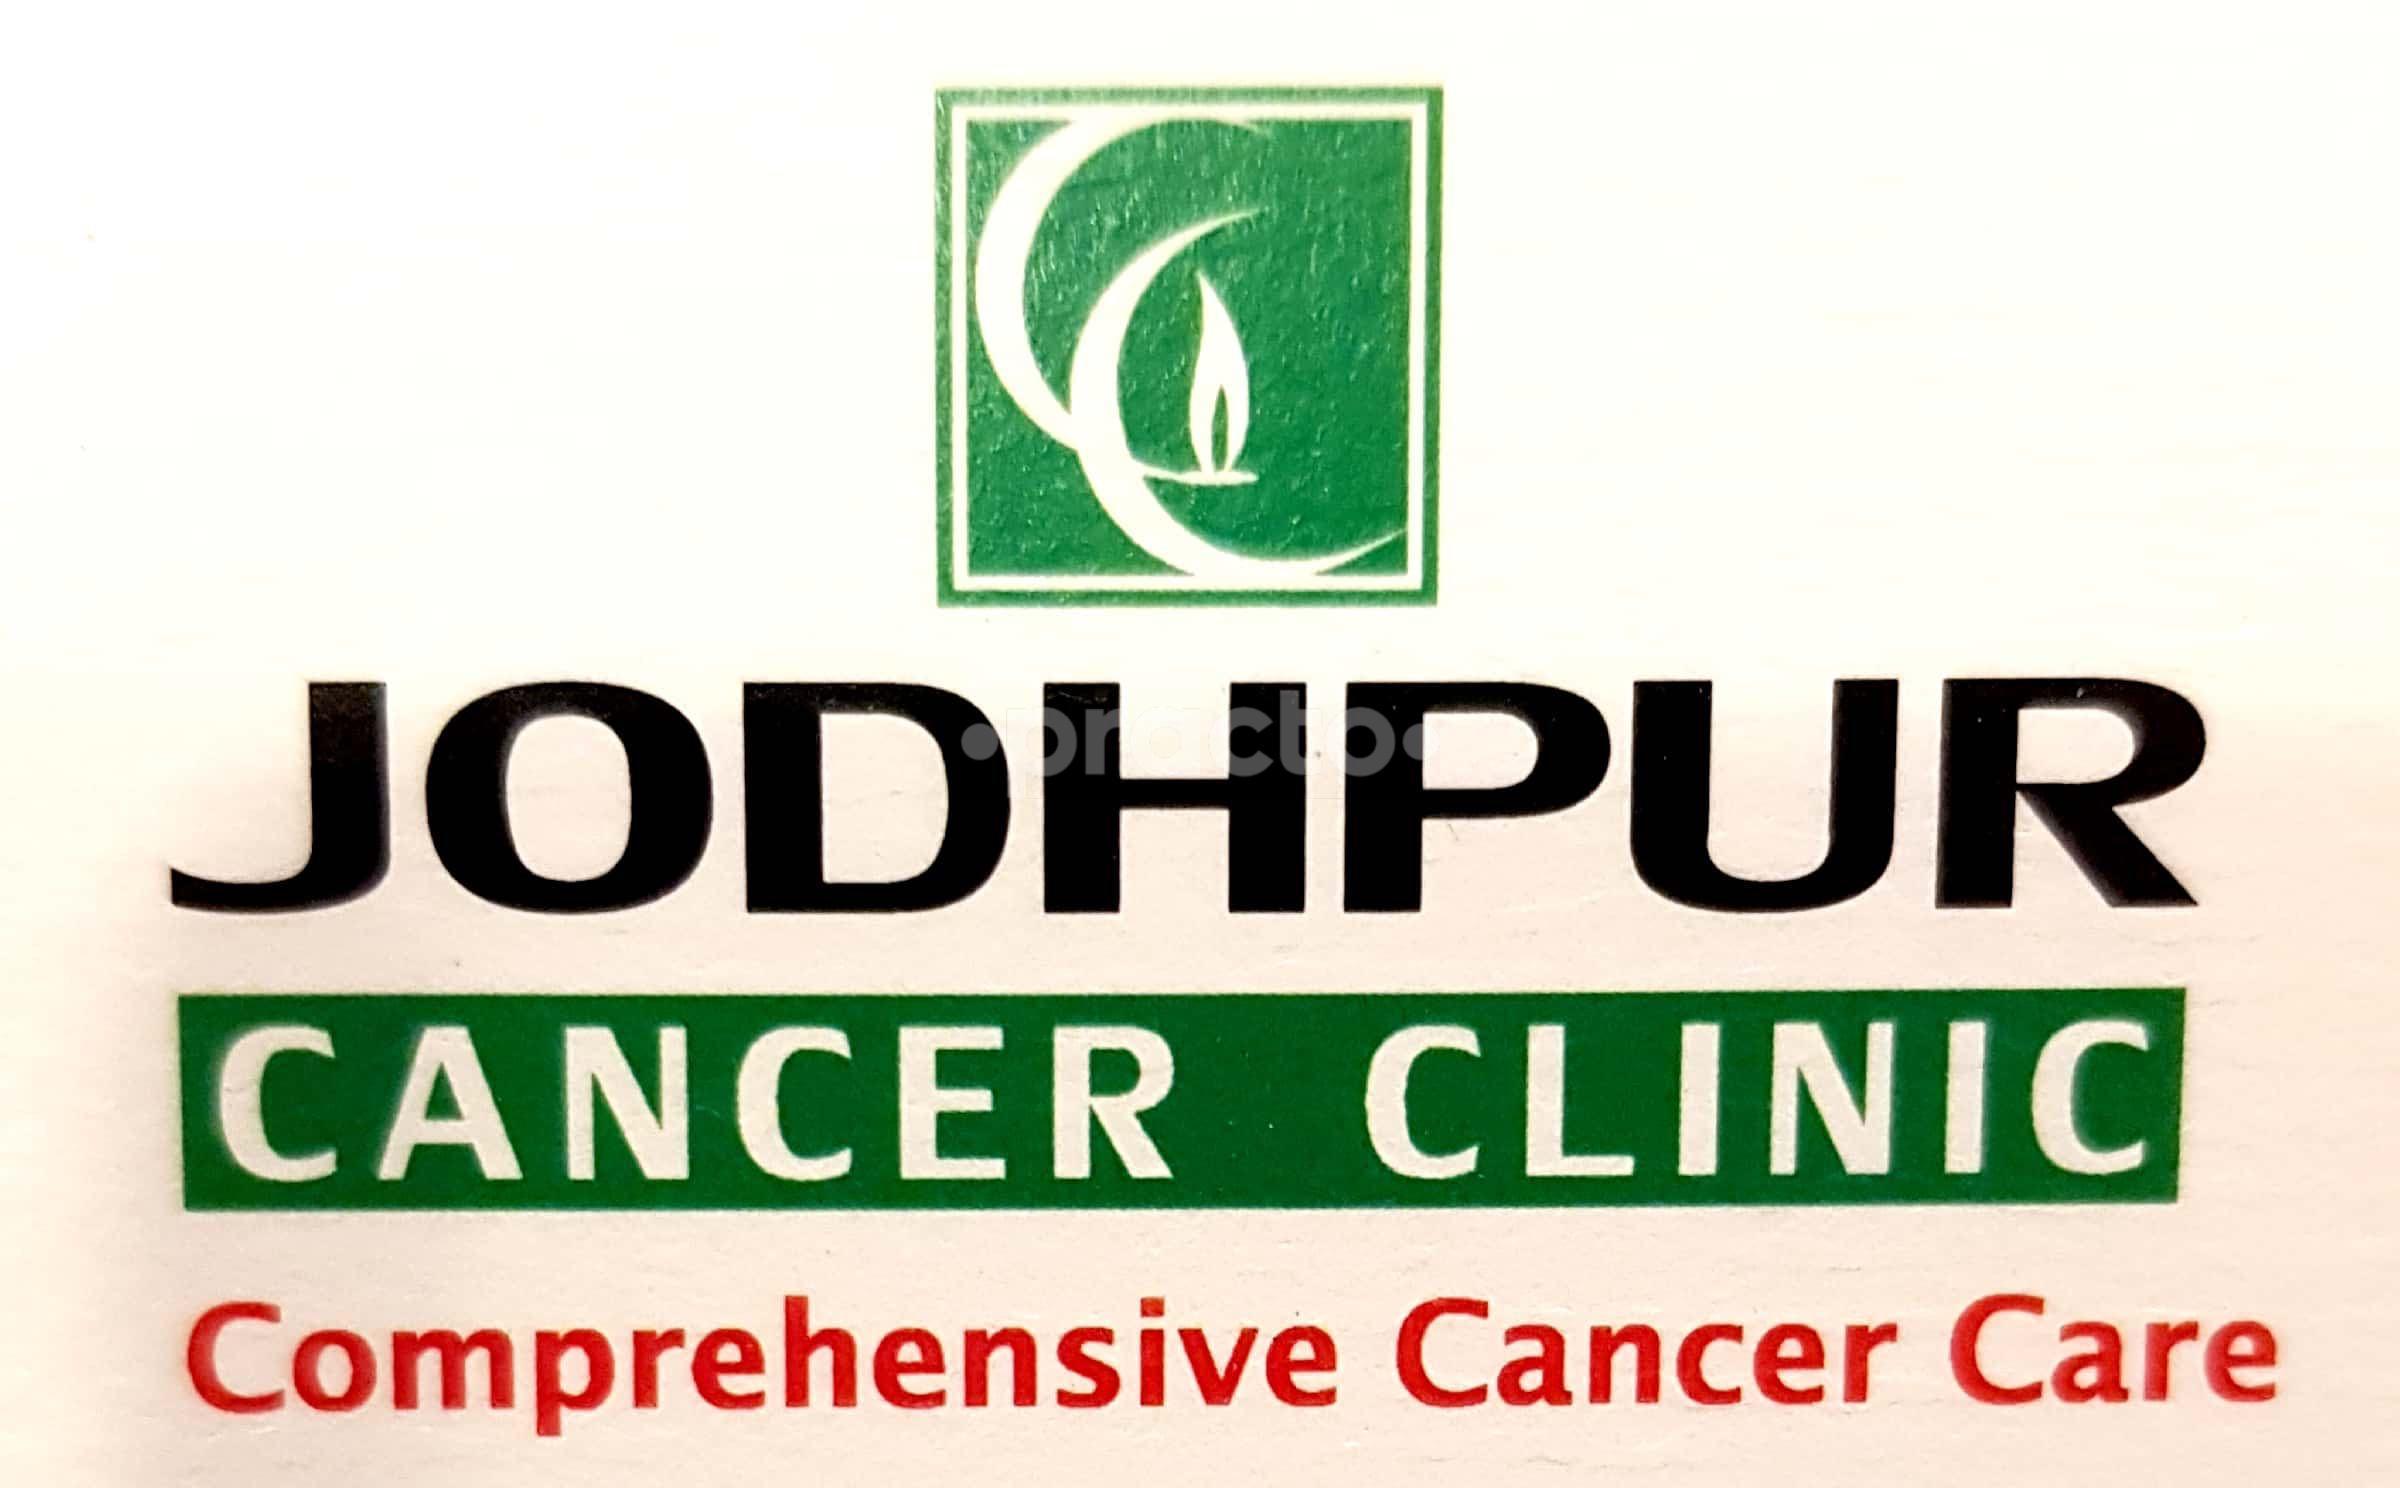 Jodhpur Cancer Clinic